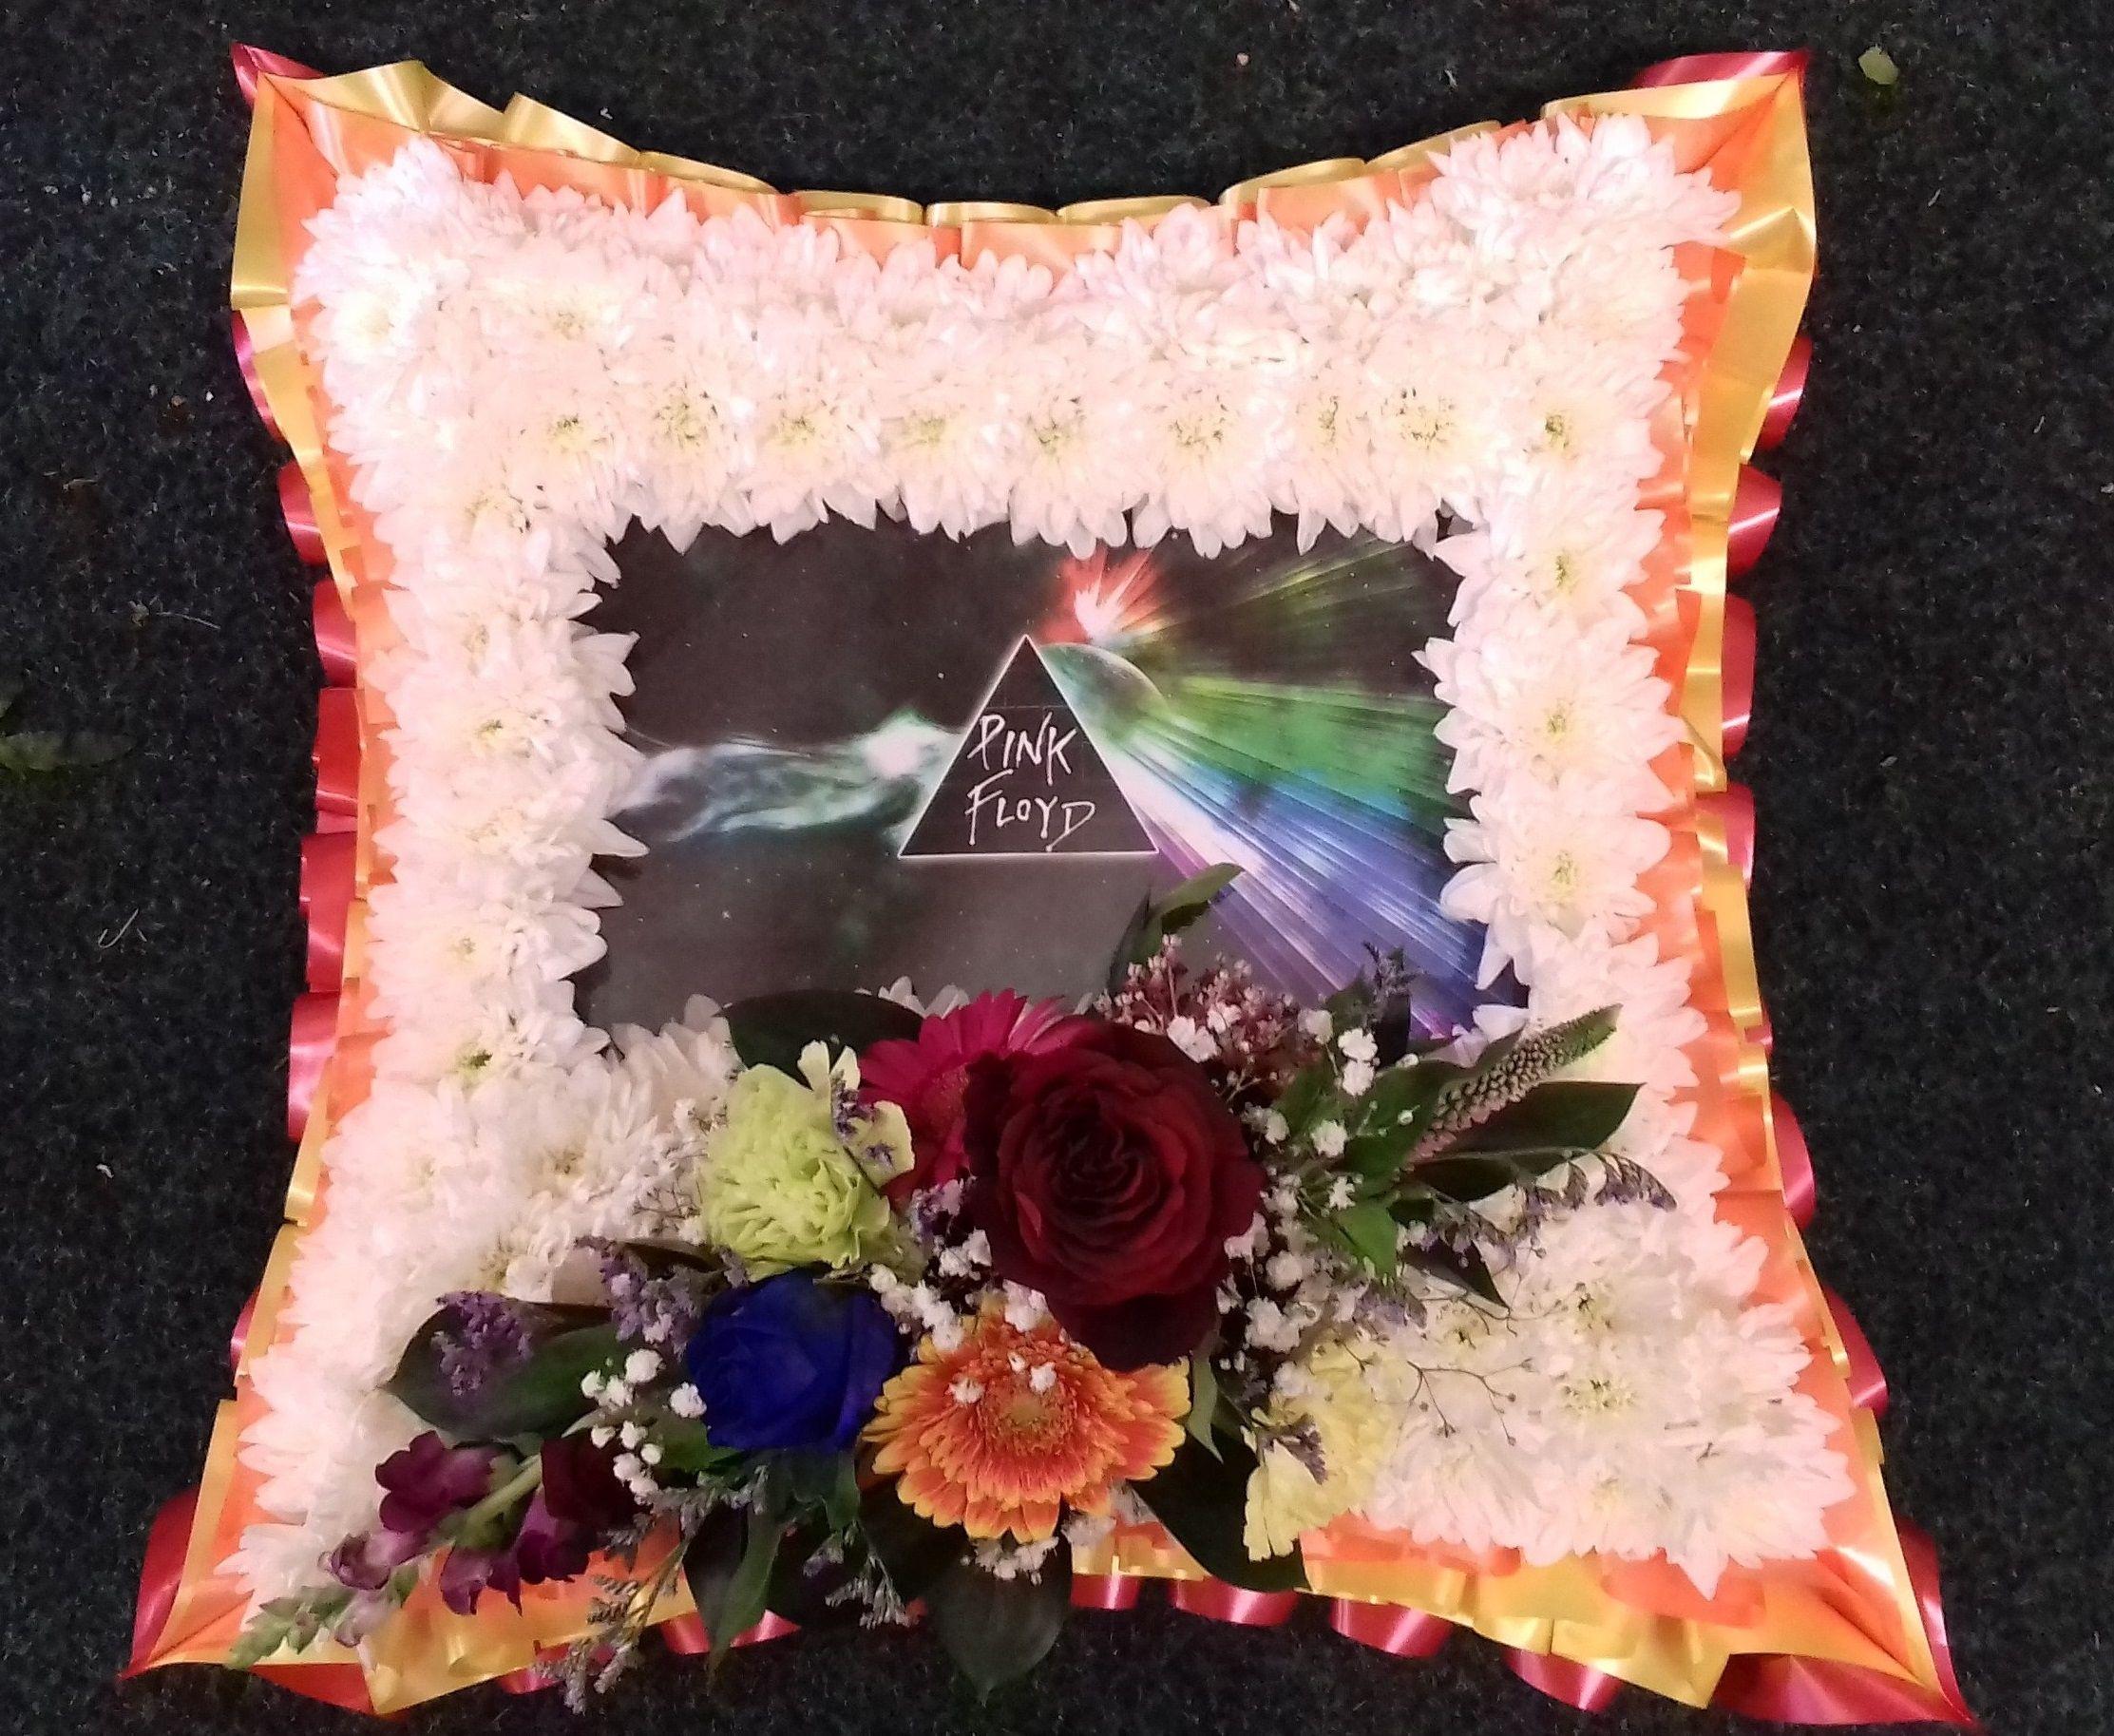 Funeral flowers floralcraft flowers pink floyd funeral tribute flowers dad izmirmasajfo